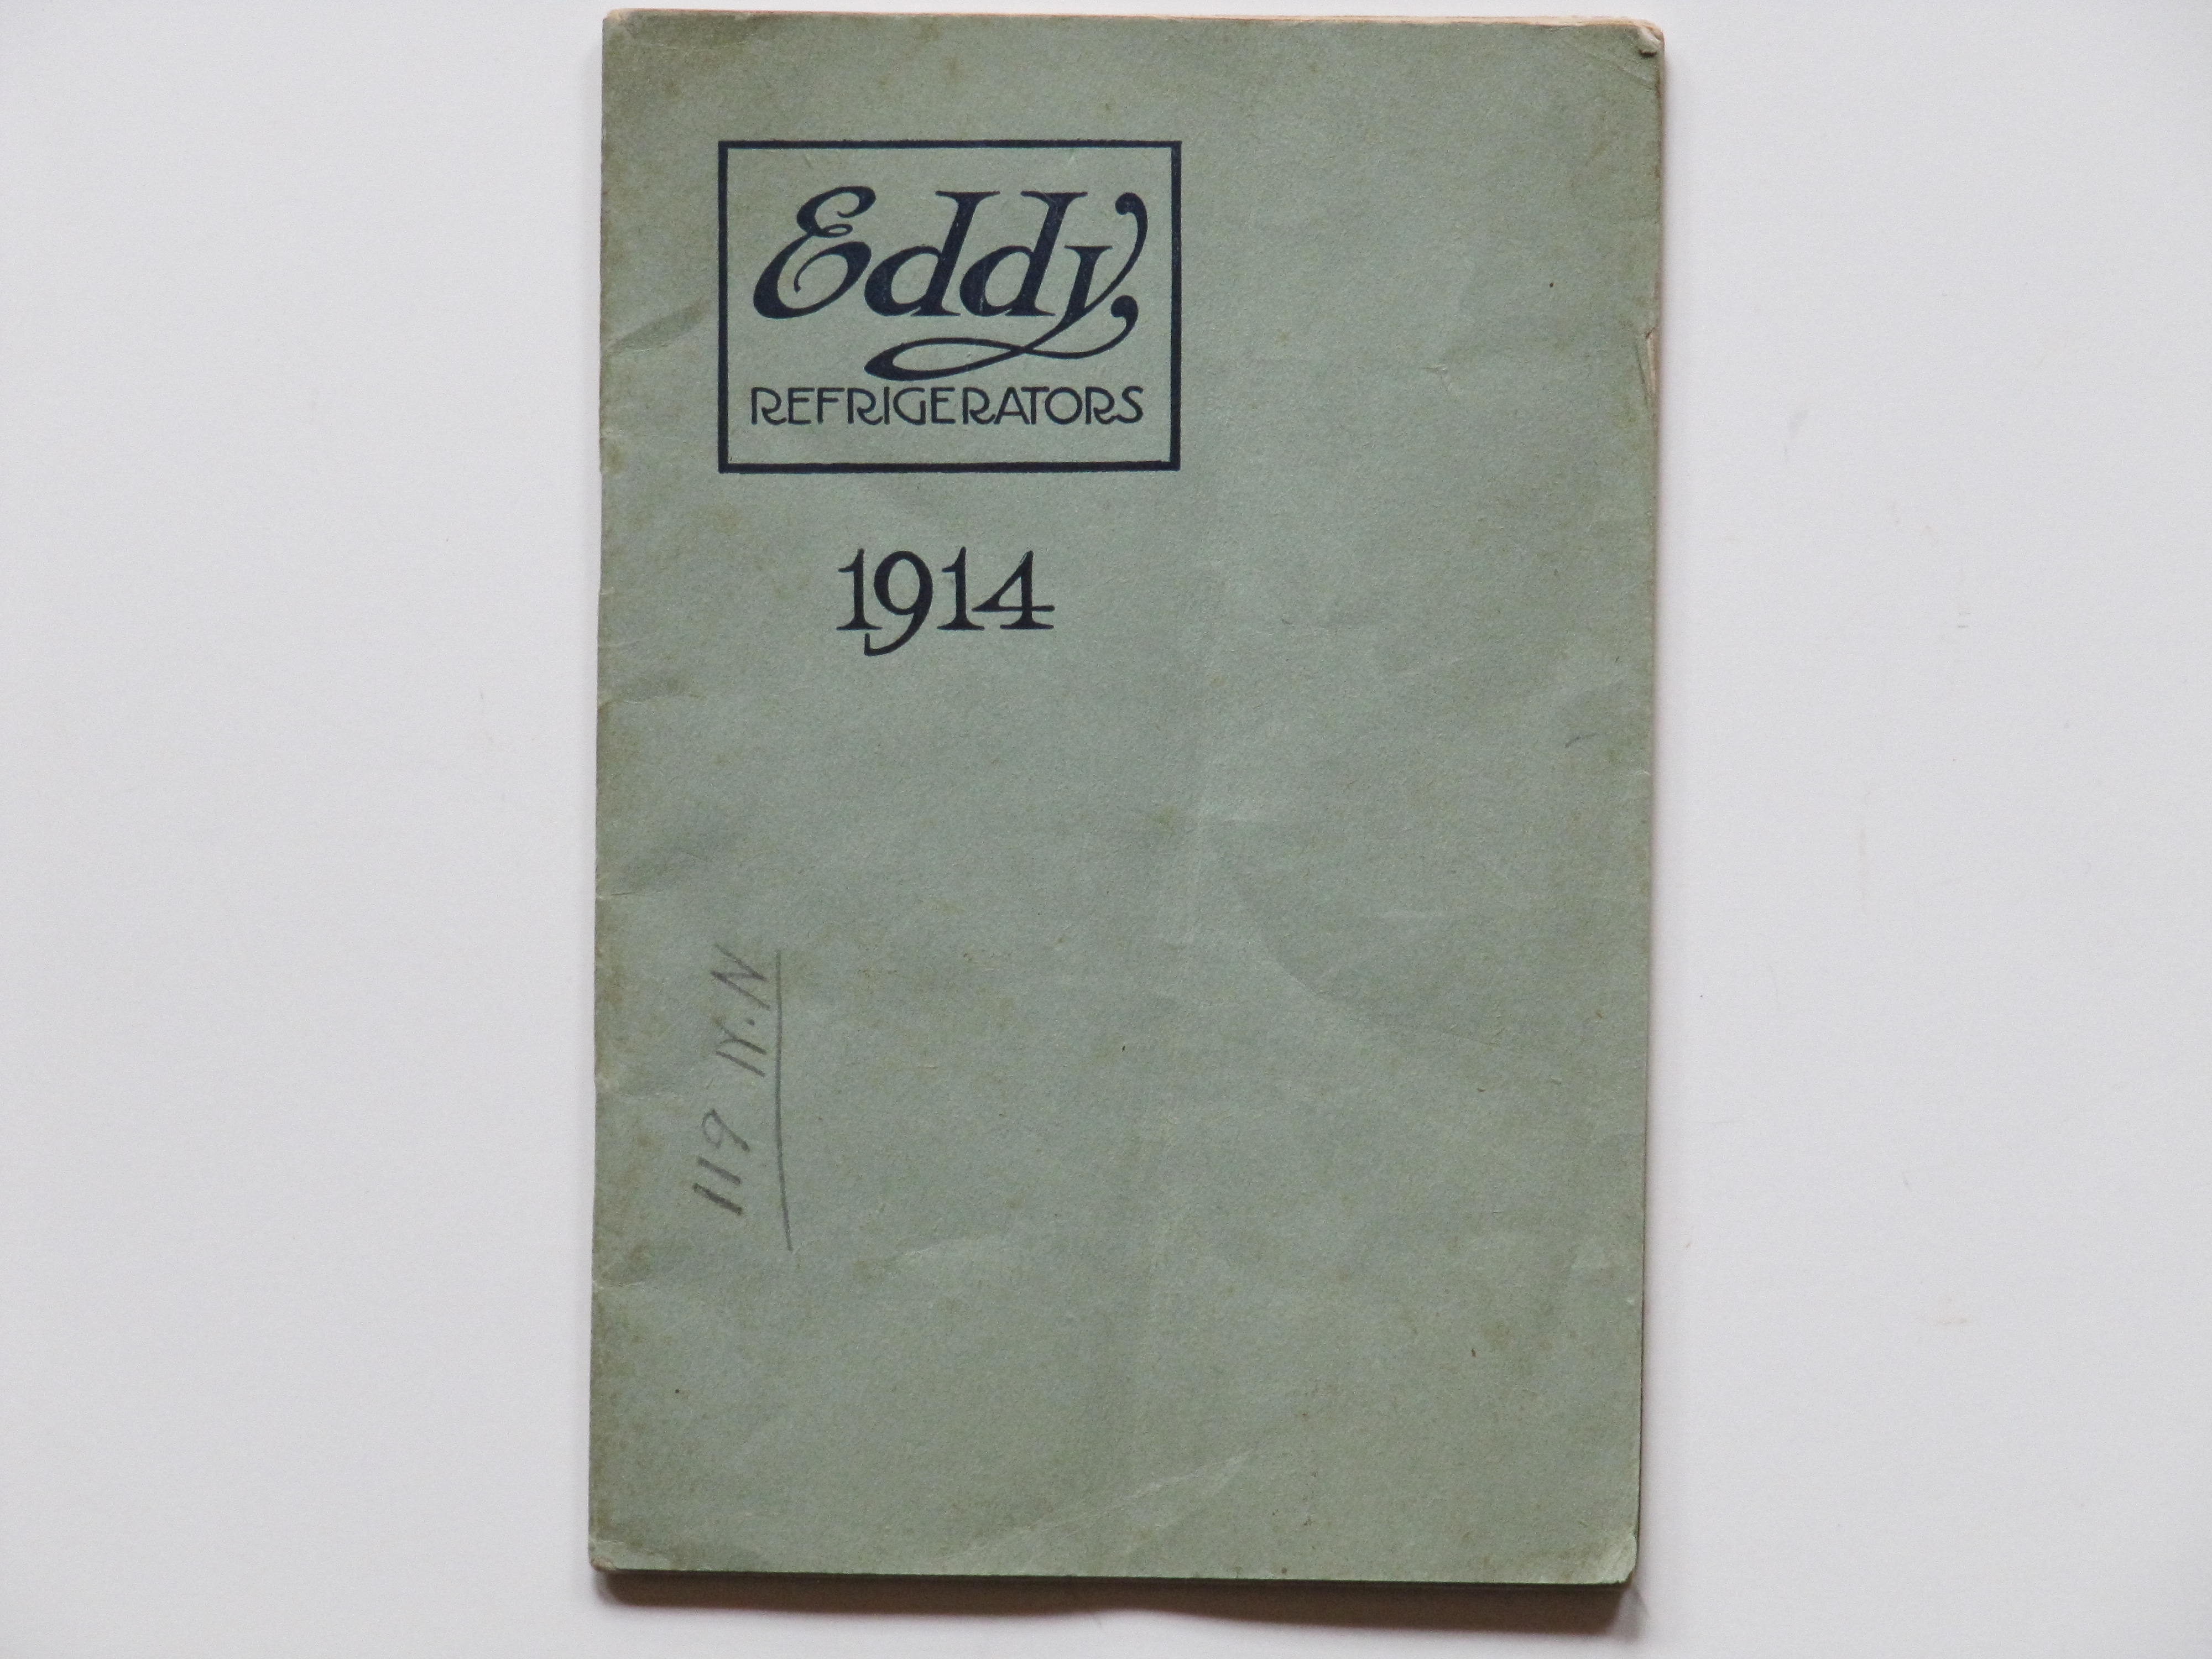 Eddy Refrigerators 1914